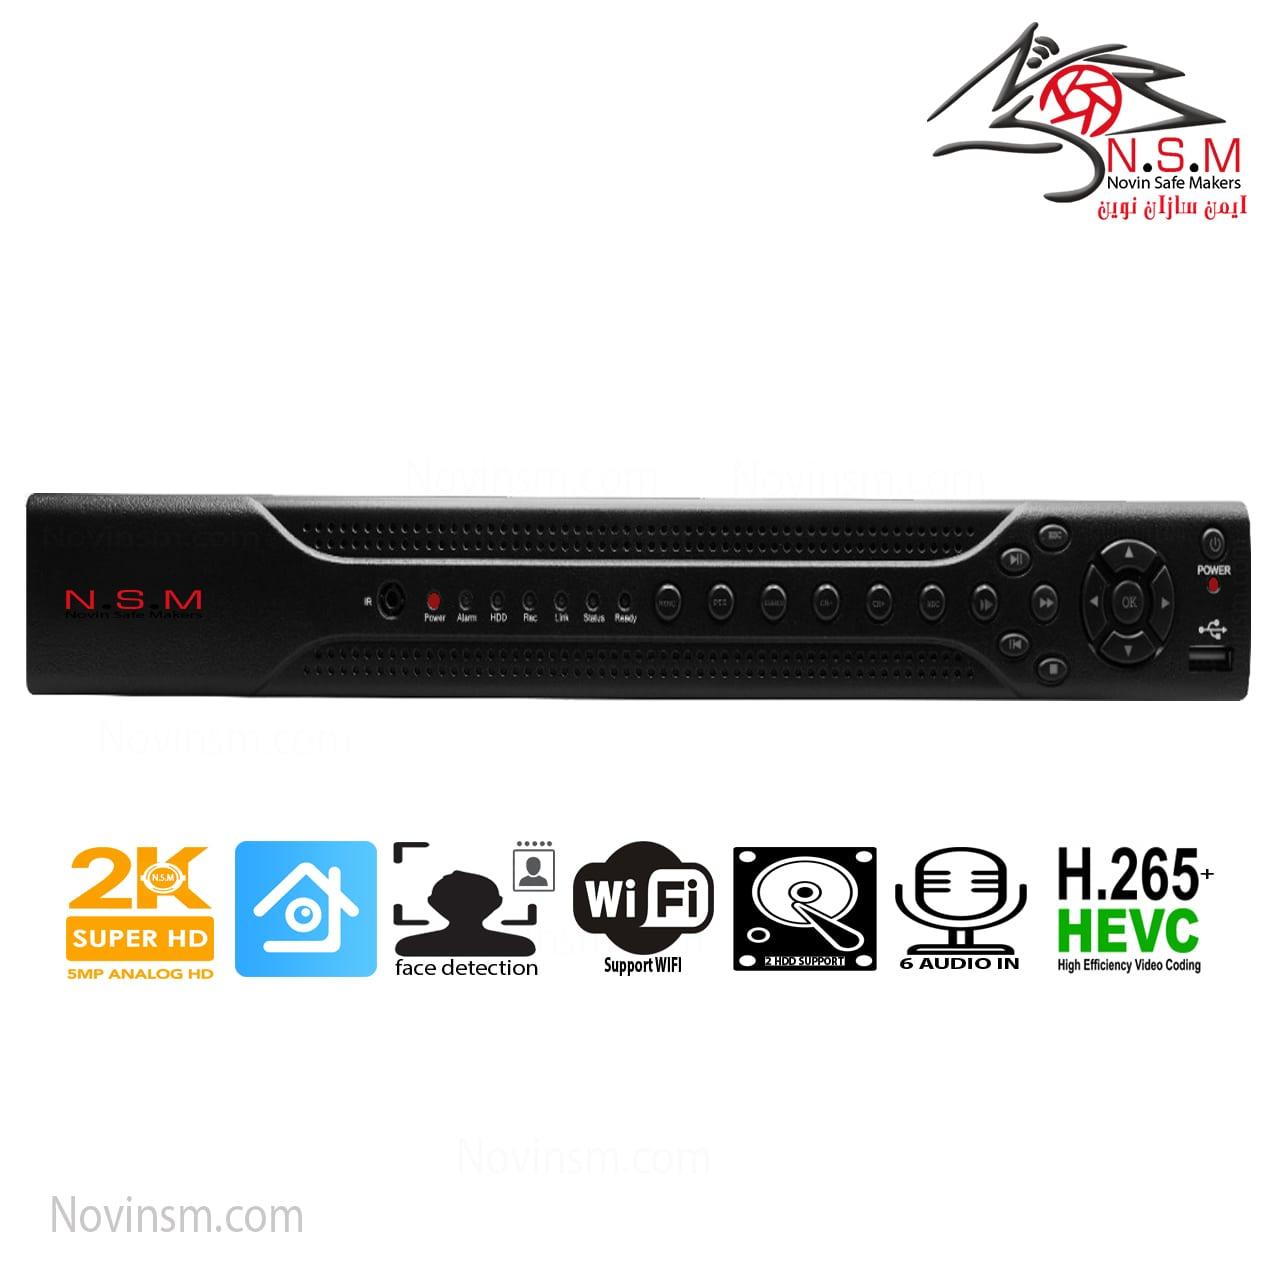 دستگاه ضبط 16 کانال 5 مگاپیکسل   6 صدا